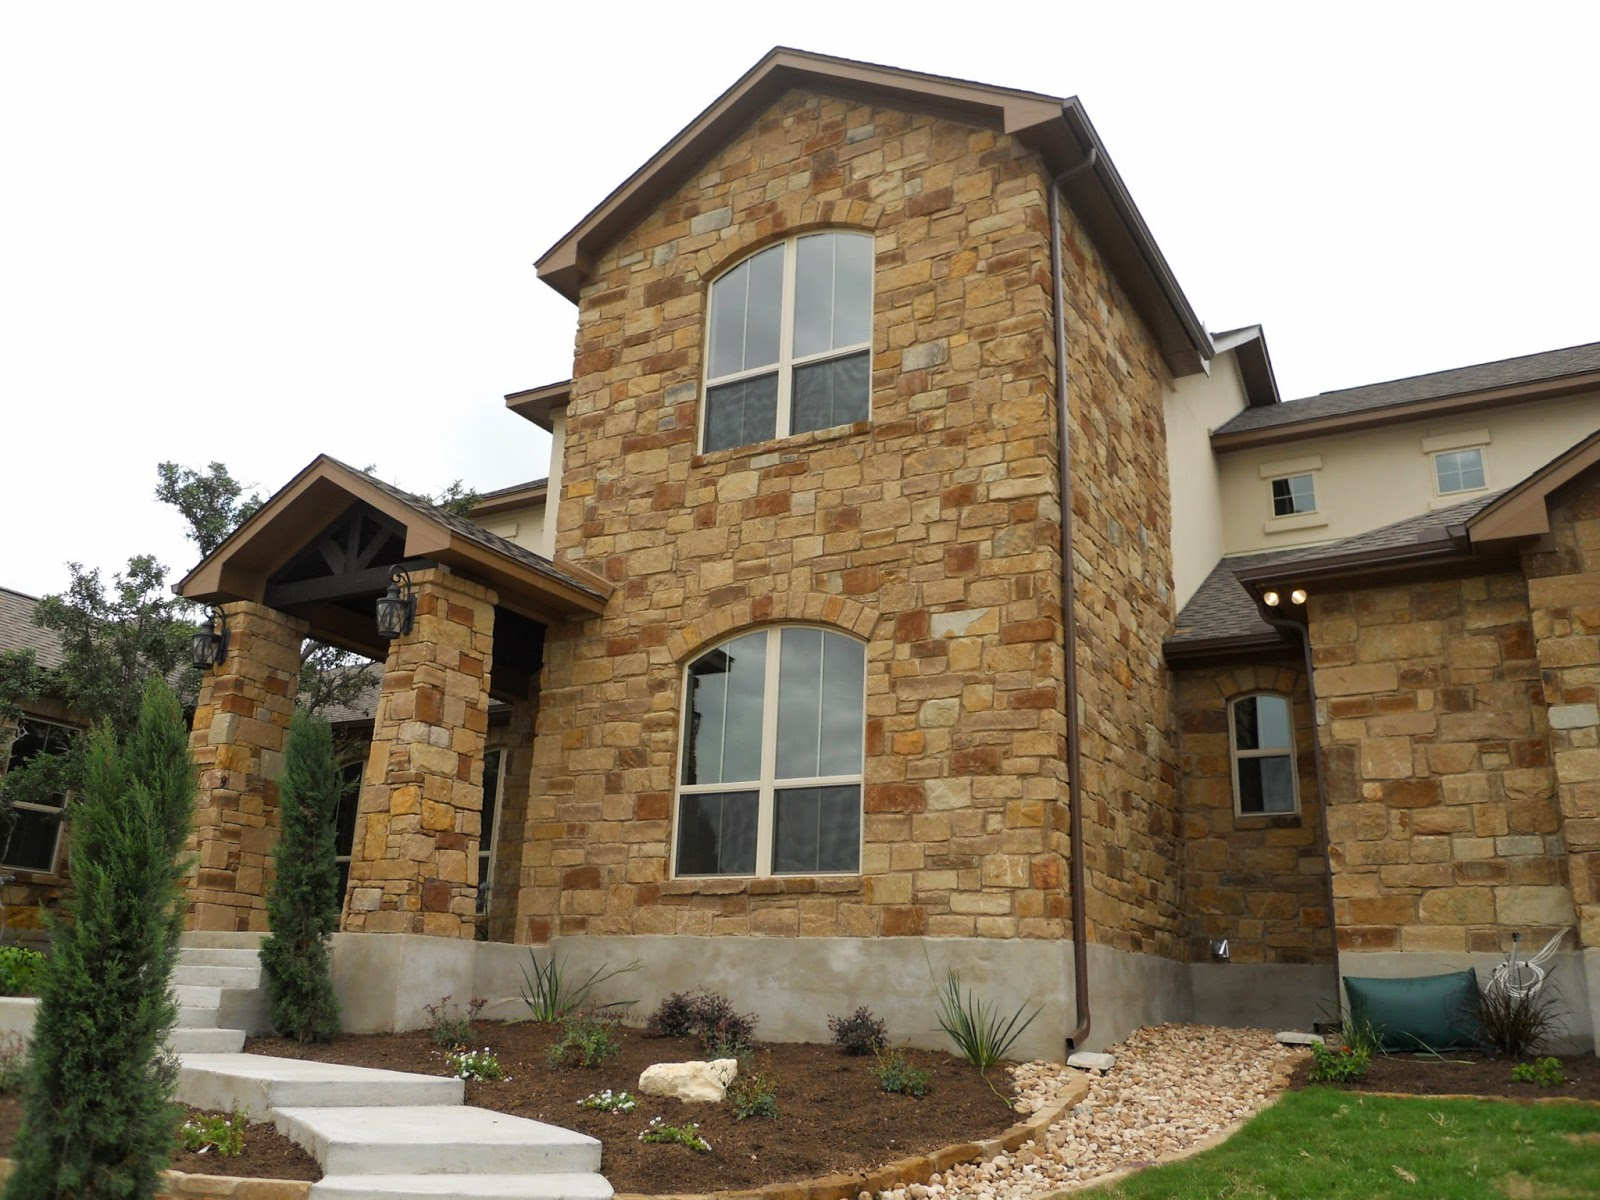 Rob Sanders Designer Custom Home Remodel Design